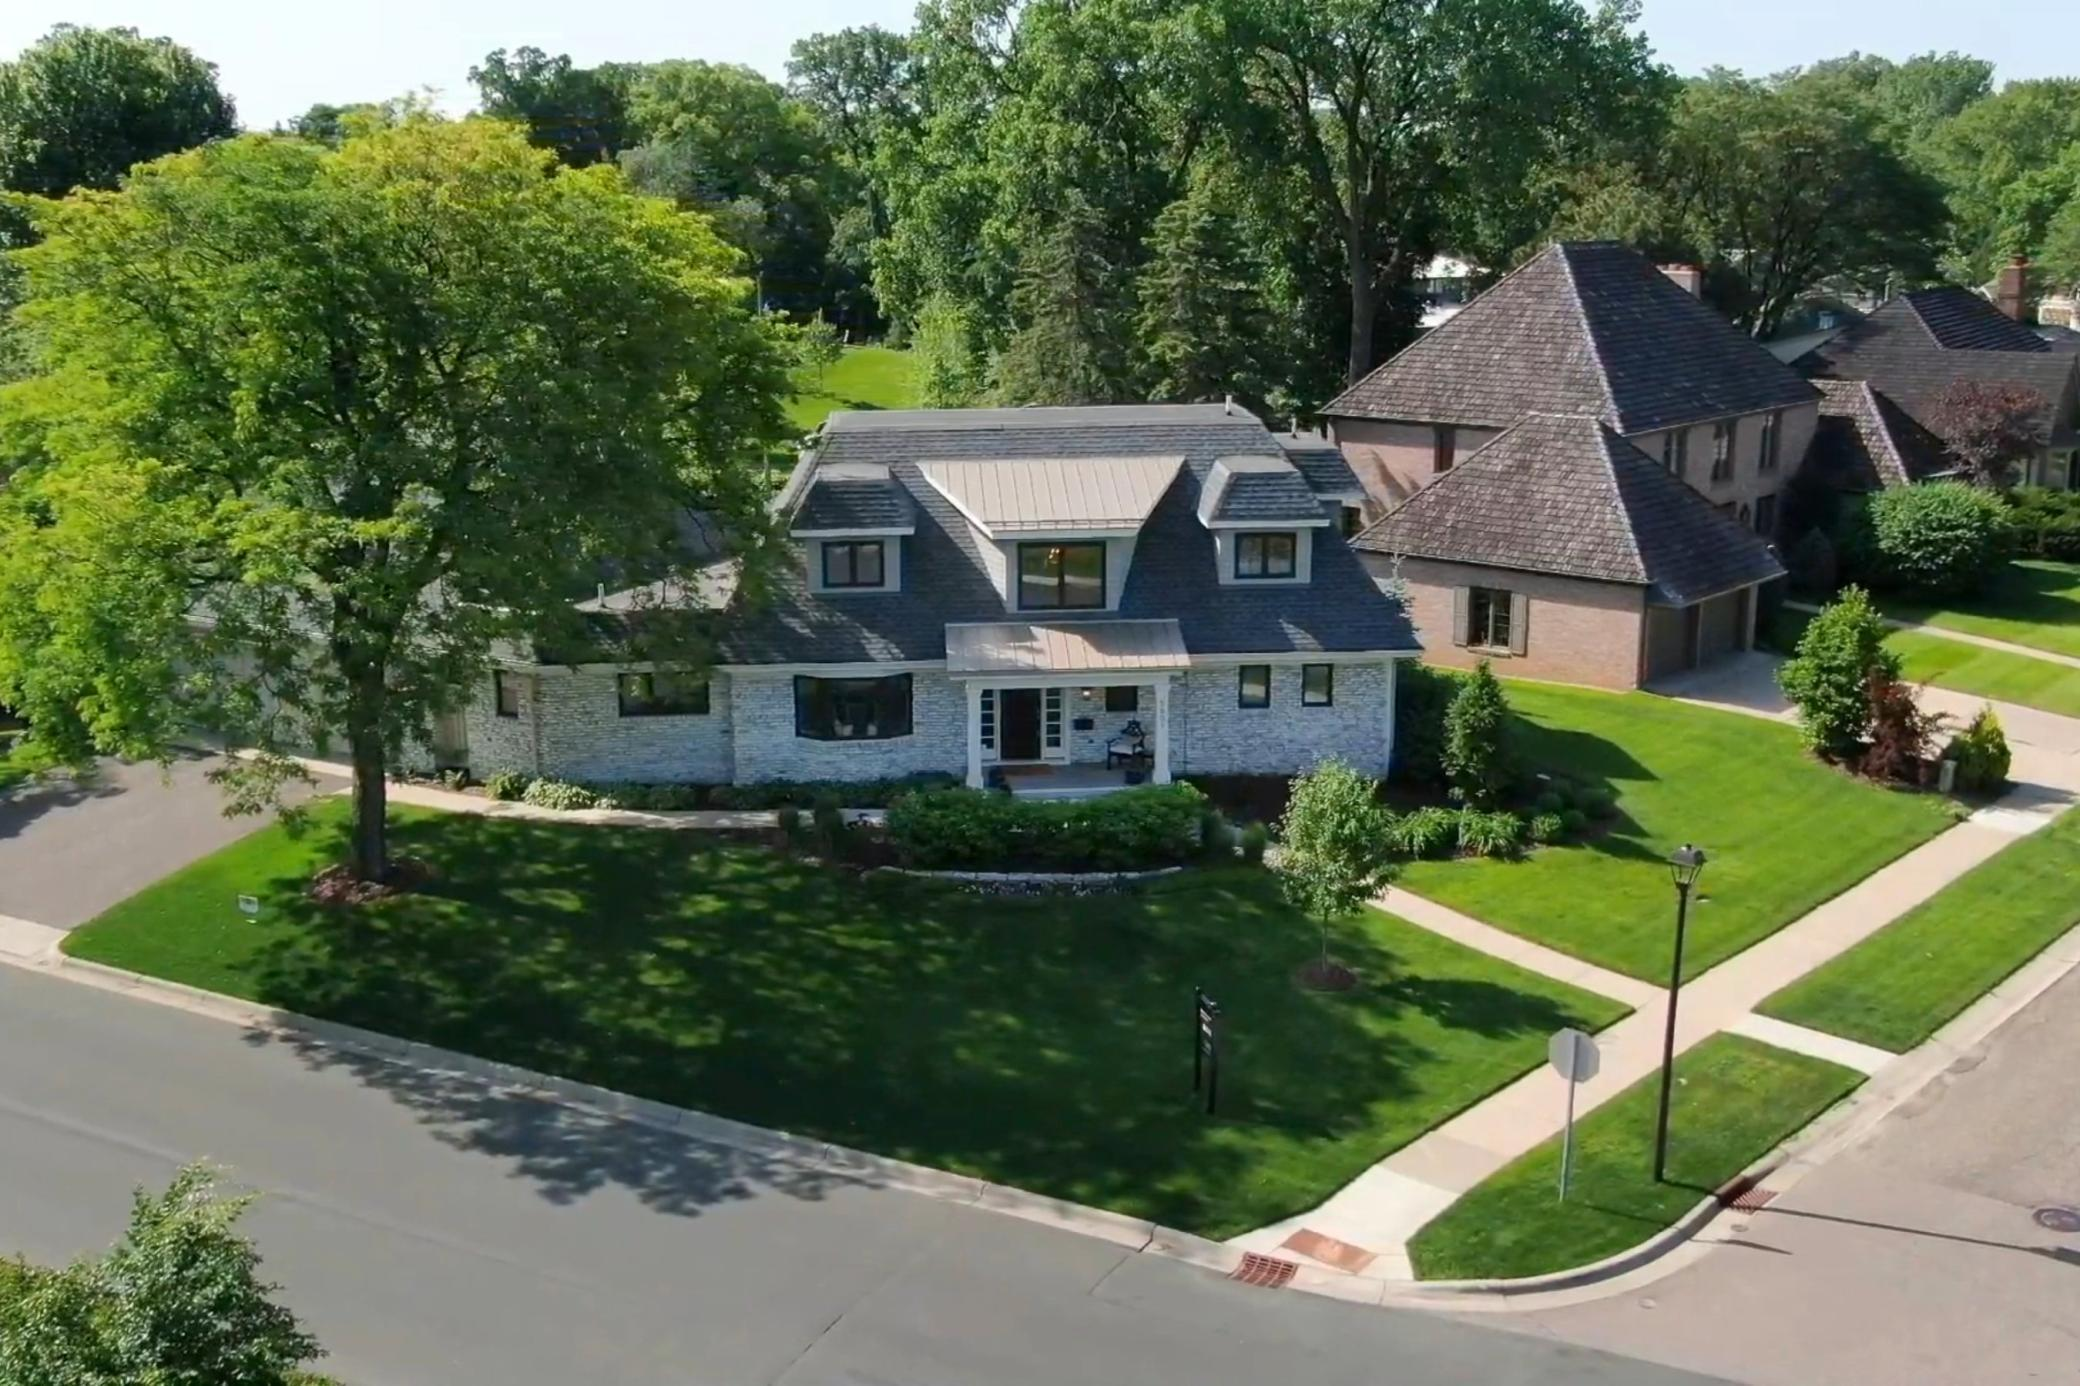 , Edina, MN 55424 - Edina, MN real estate listing